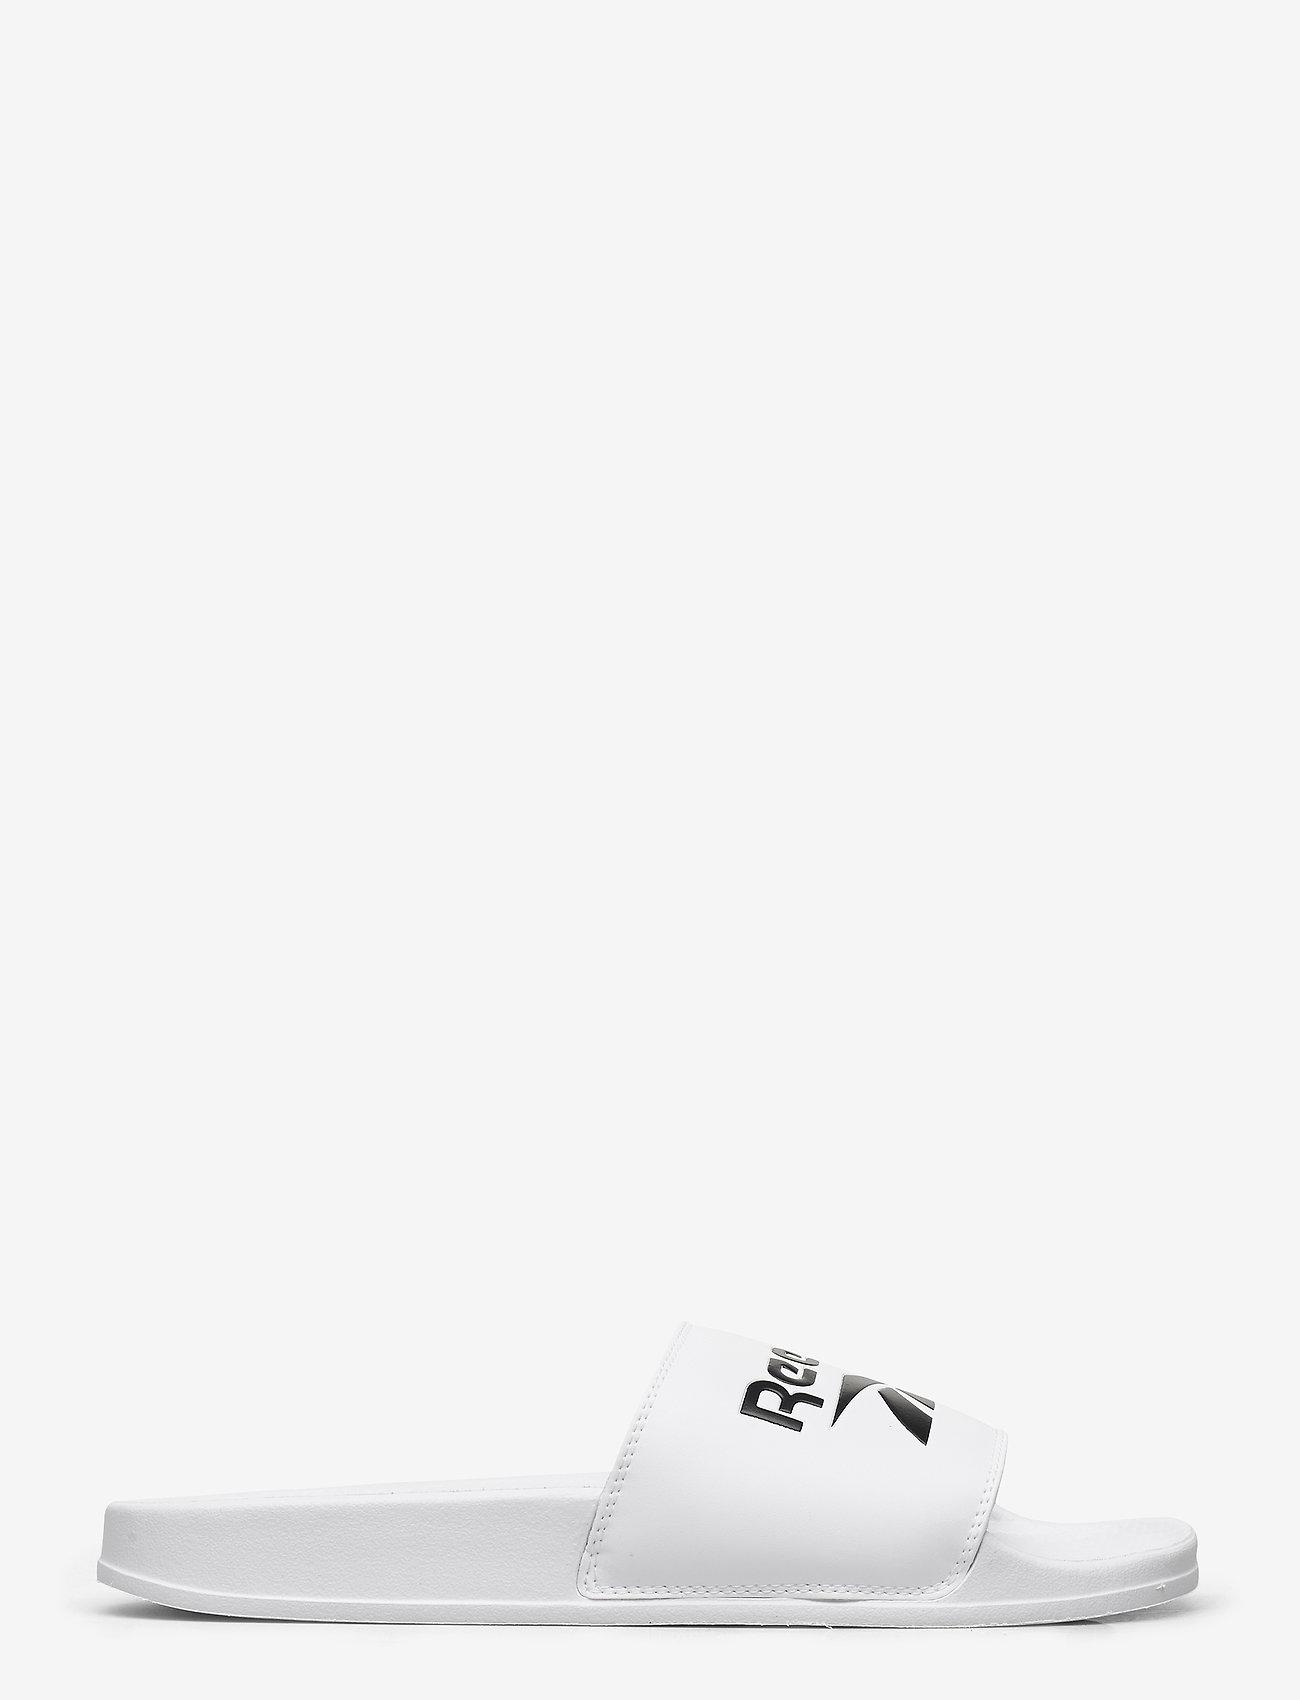 Reebok Classics - REEBOK CLASSIC SLIDE - sneakers - white/black/white - 1